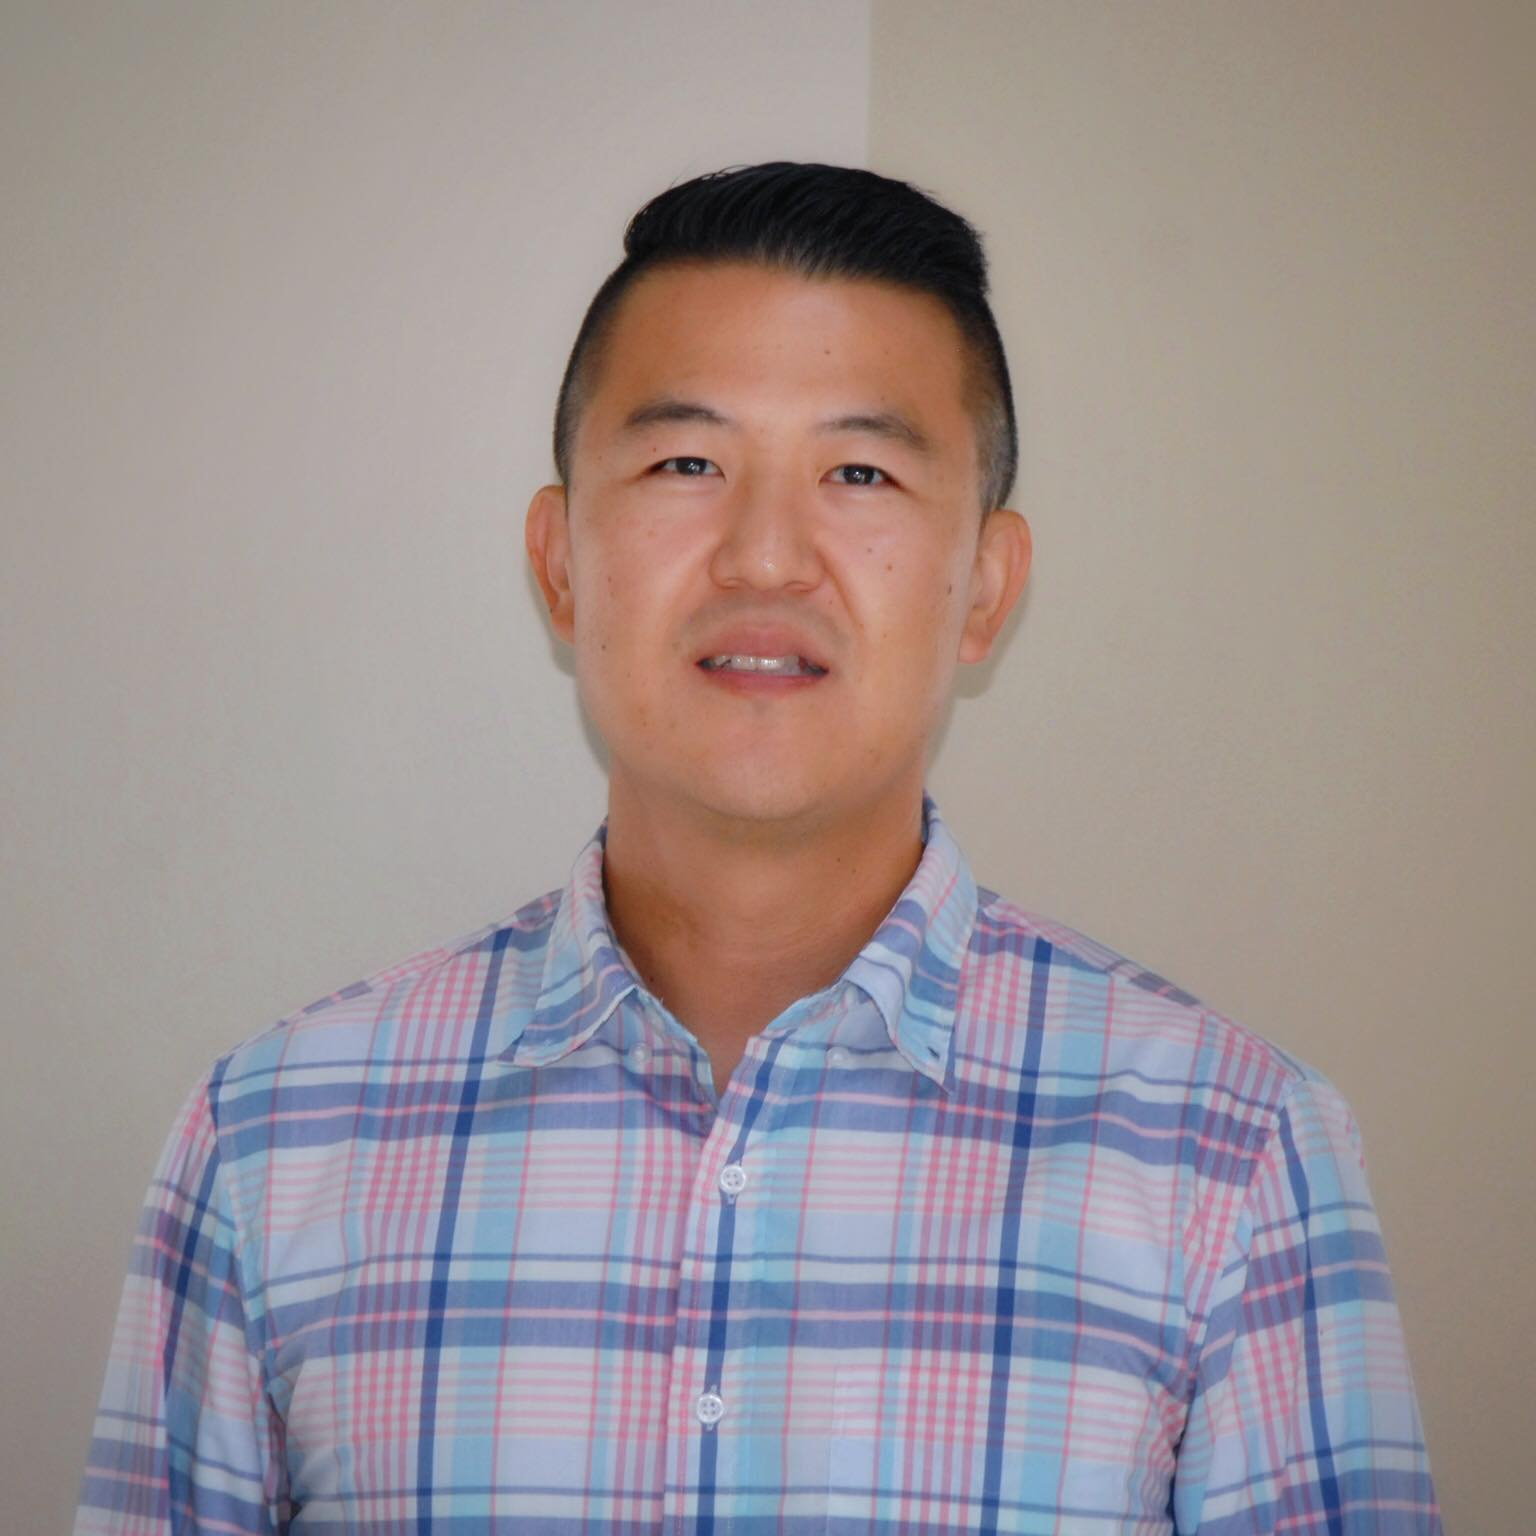 Paul Sul - Agent / paulsul@d2travel.com